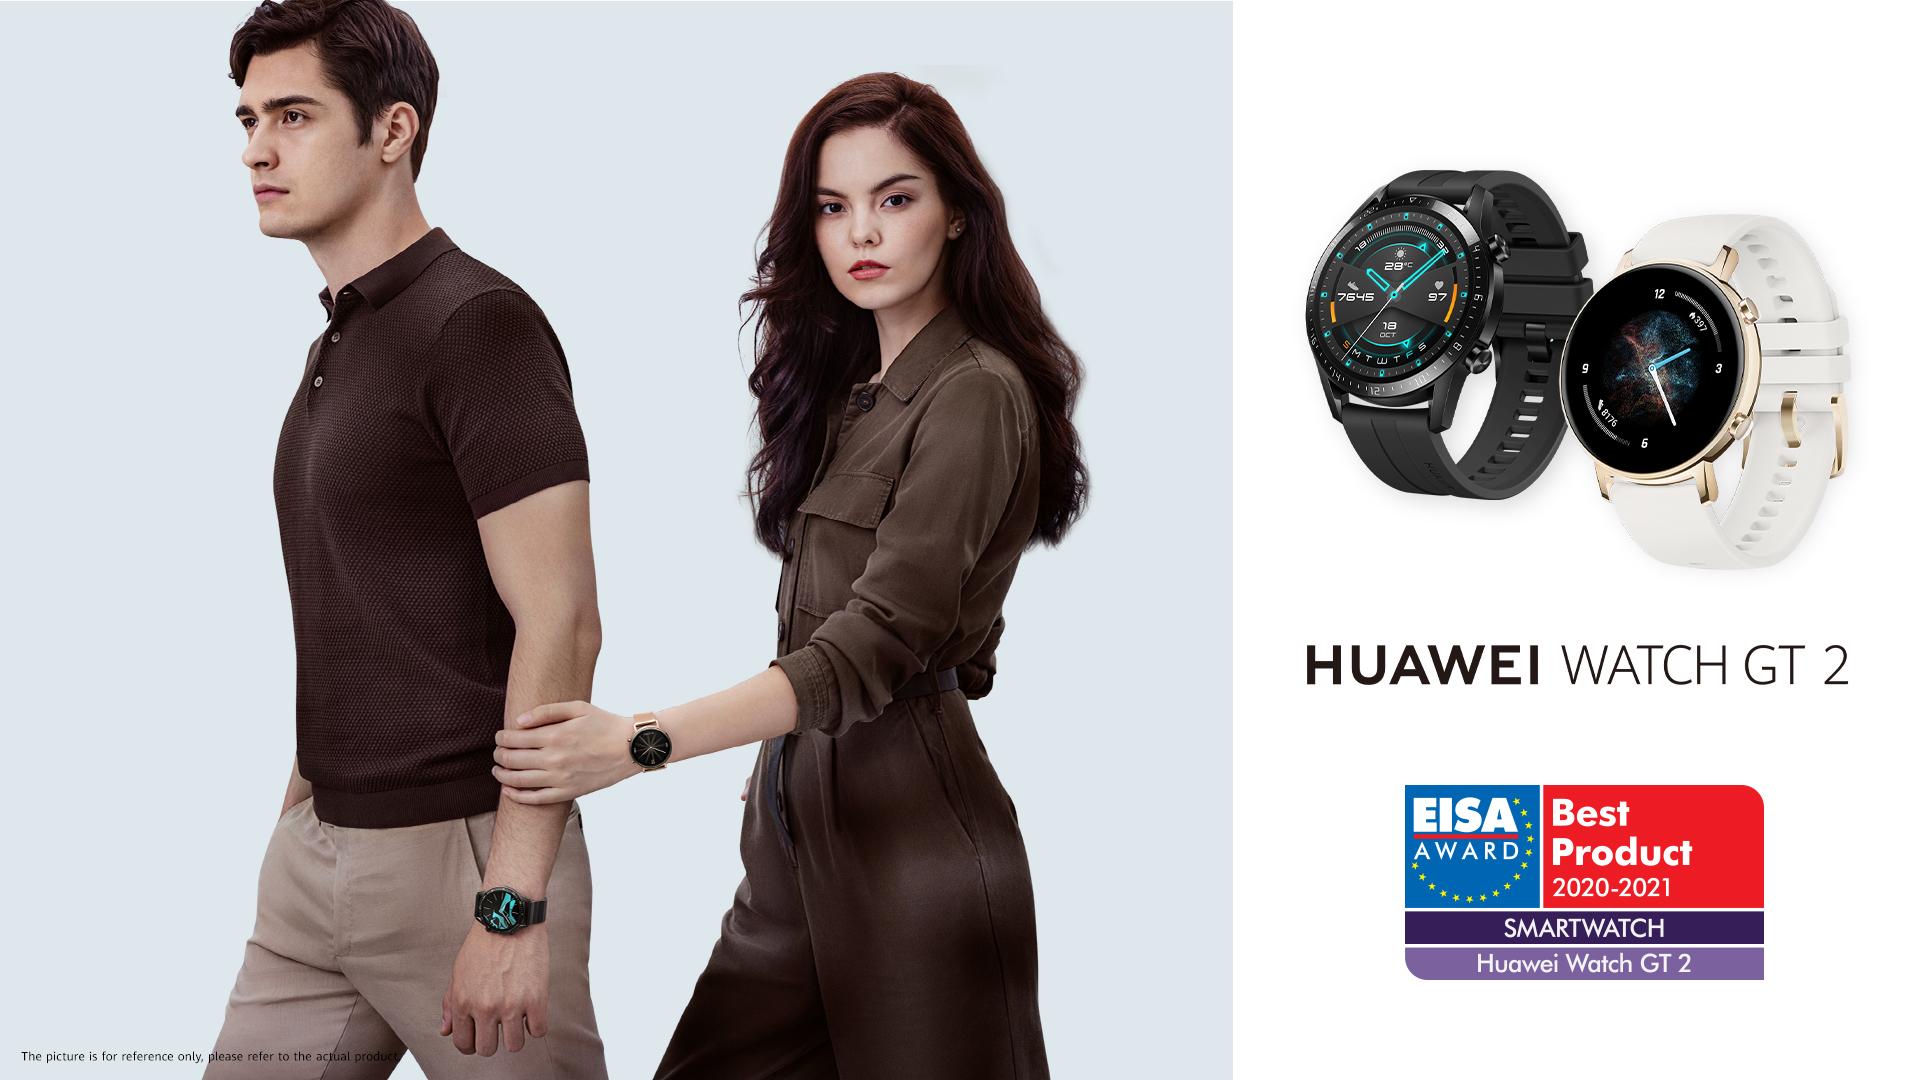 Smartwach Huawei Watch GT 2 EISA